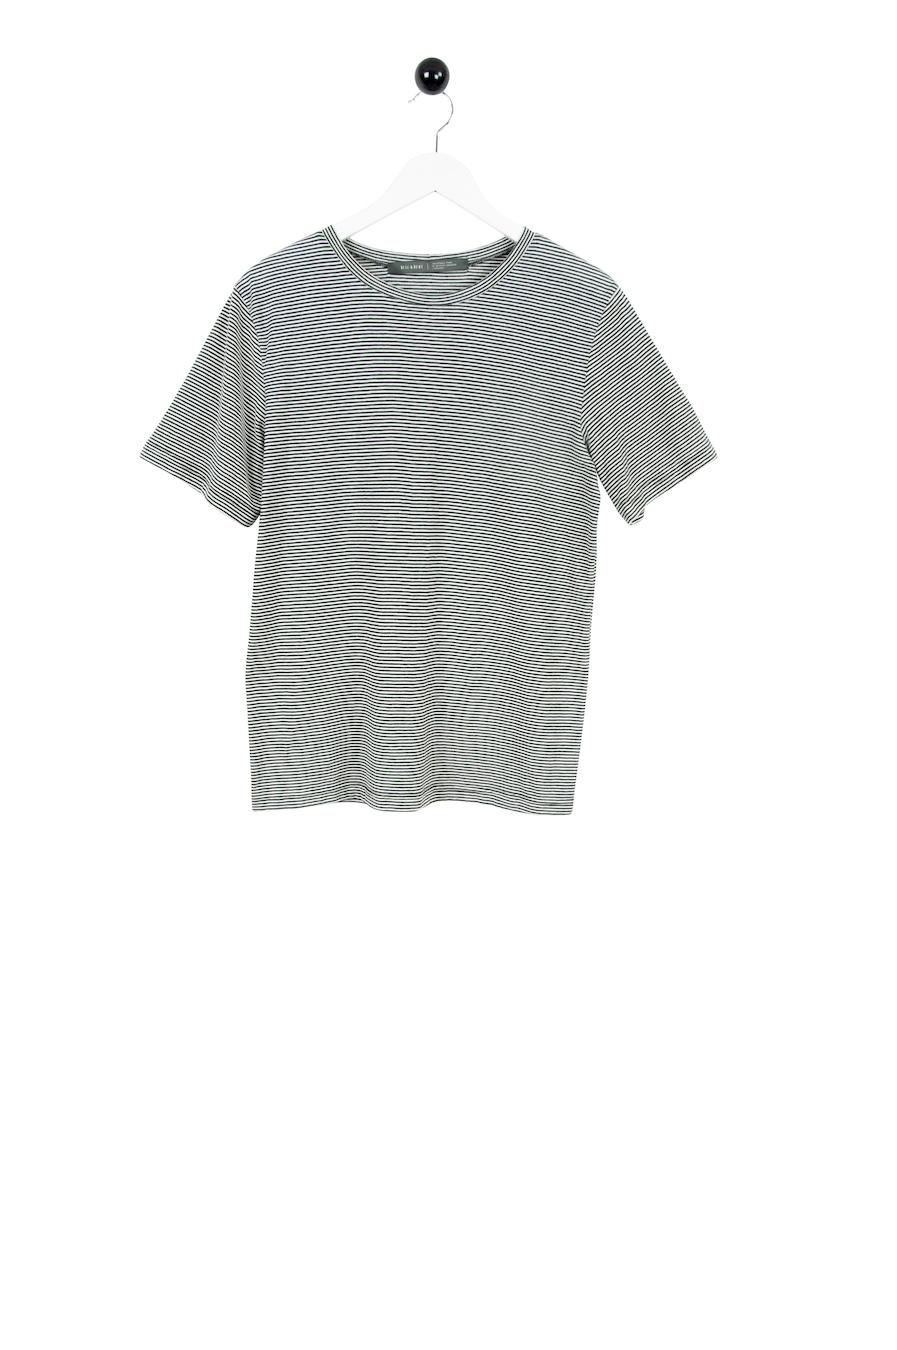 Fontana T-shirt